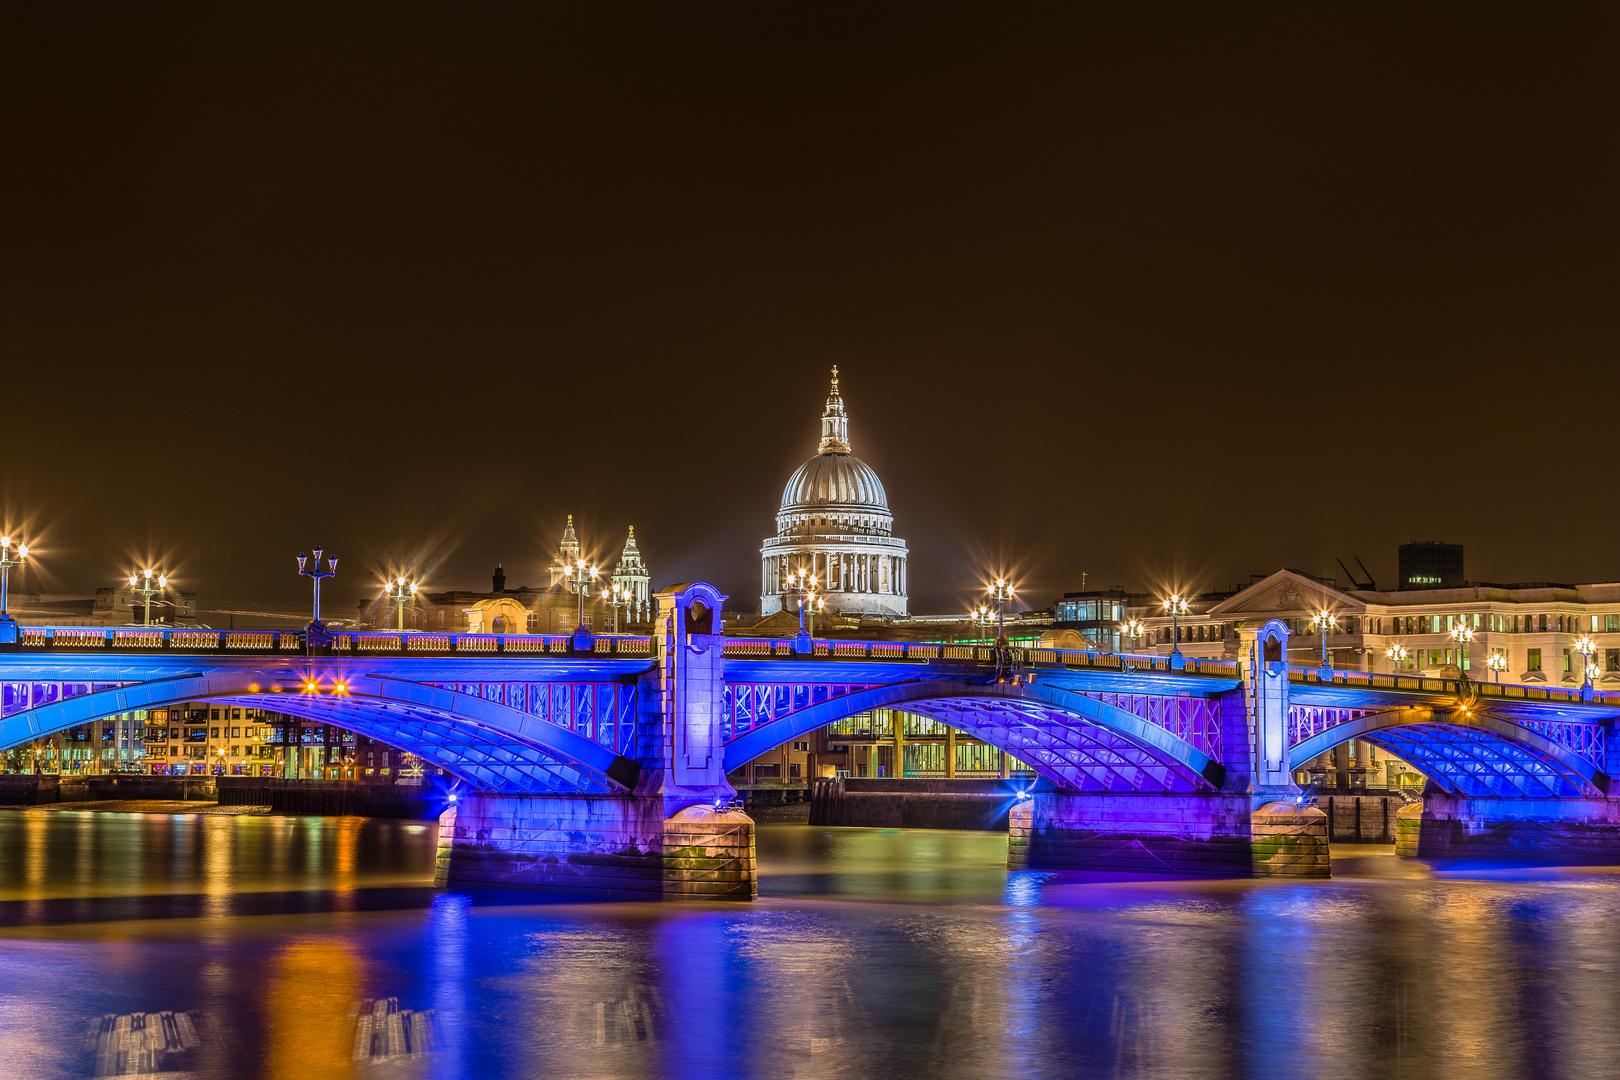 St. Paul's Cathedral über London Bridge